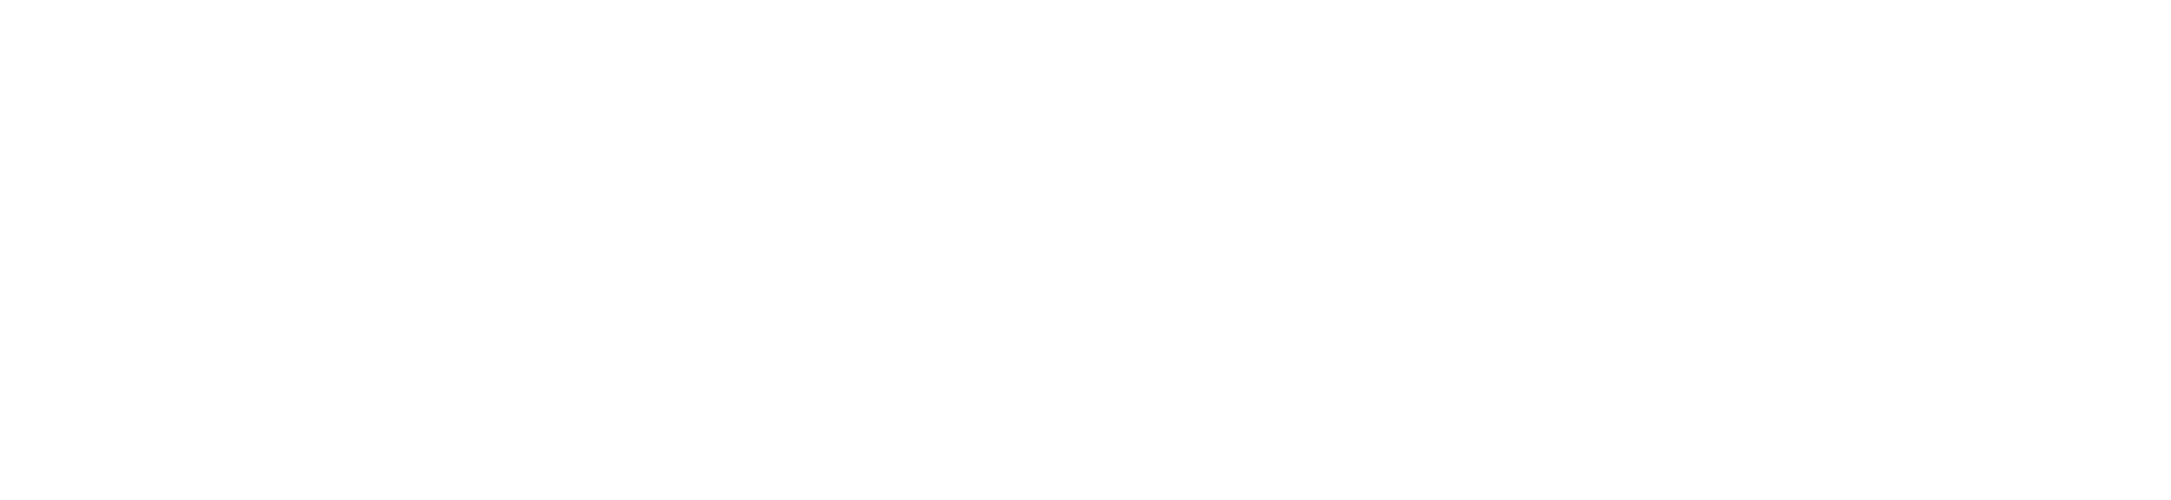 Attend: 2019 Prodealer Industry Summit